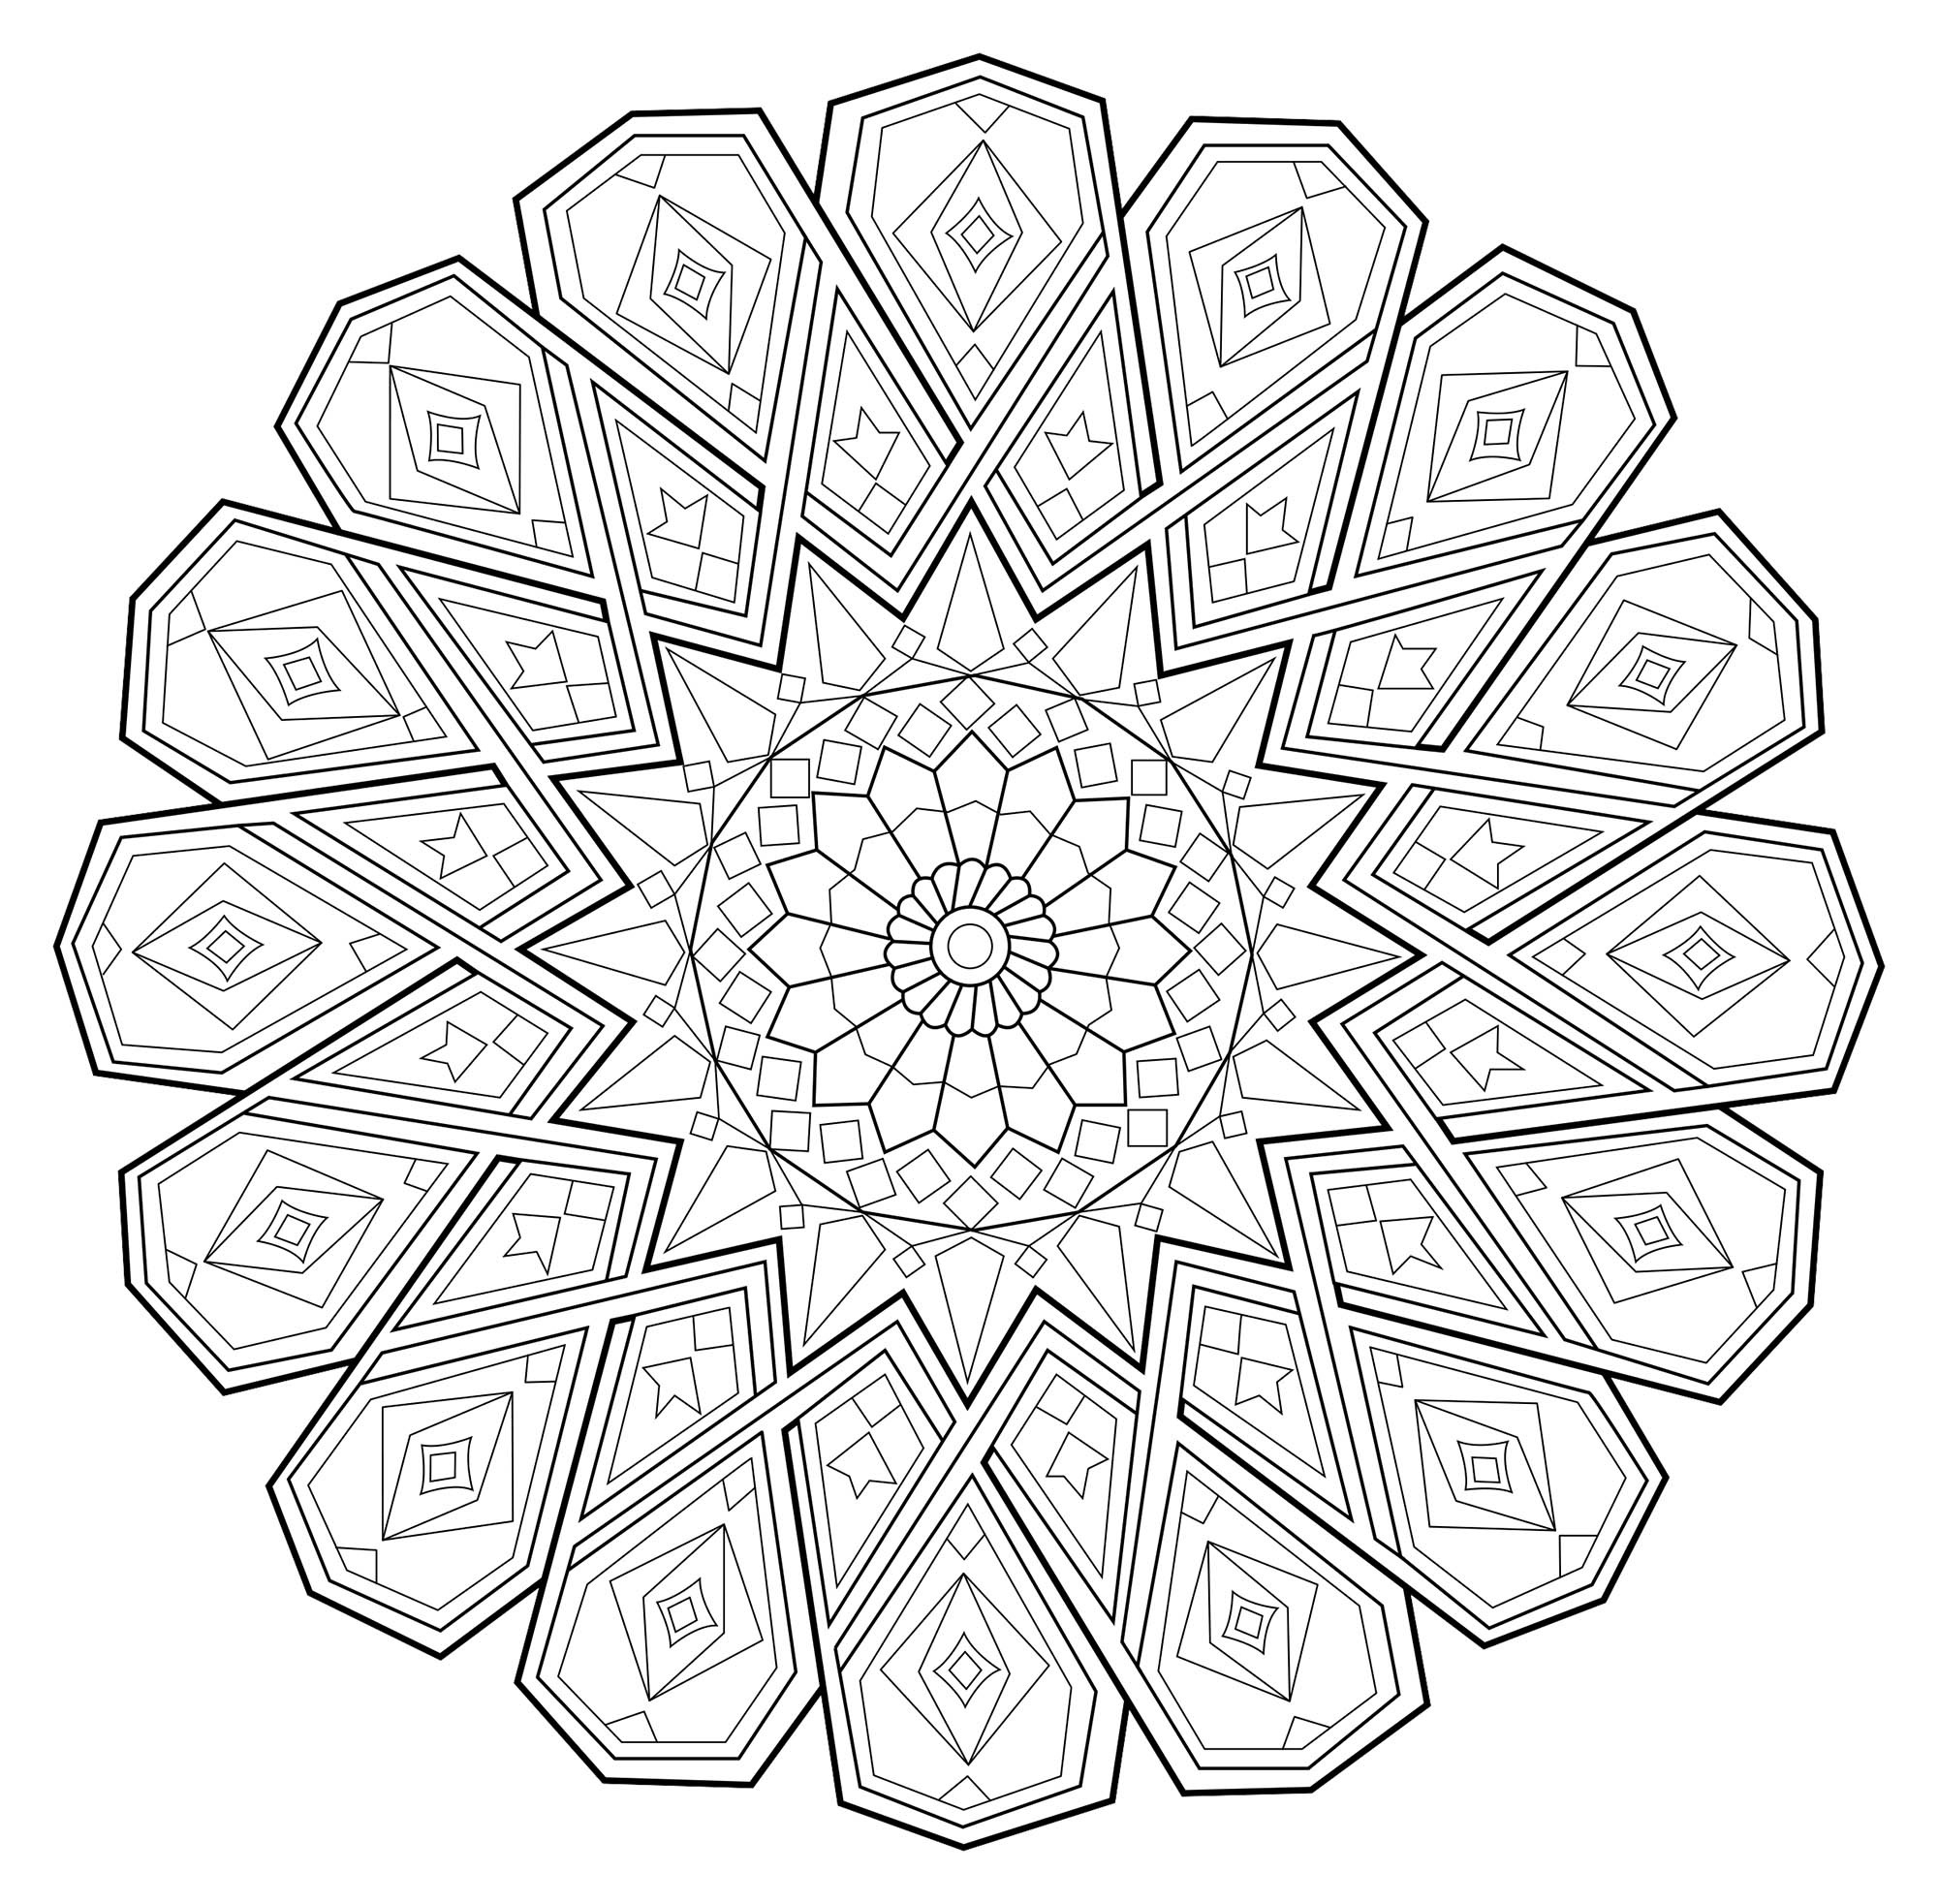 - Mandalas To Download For Free - Mandalas Kids Coloring Pages